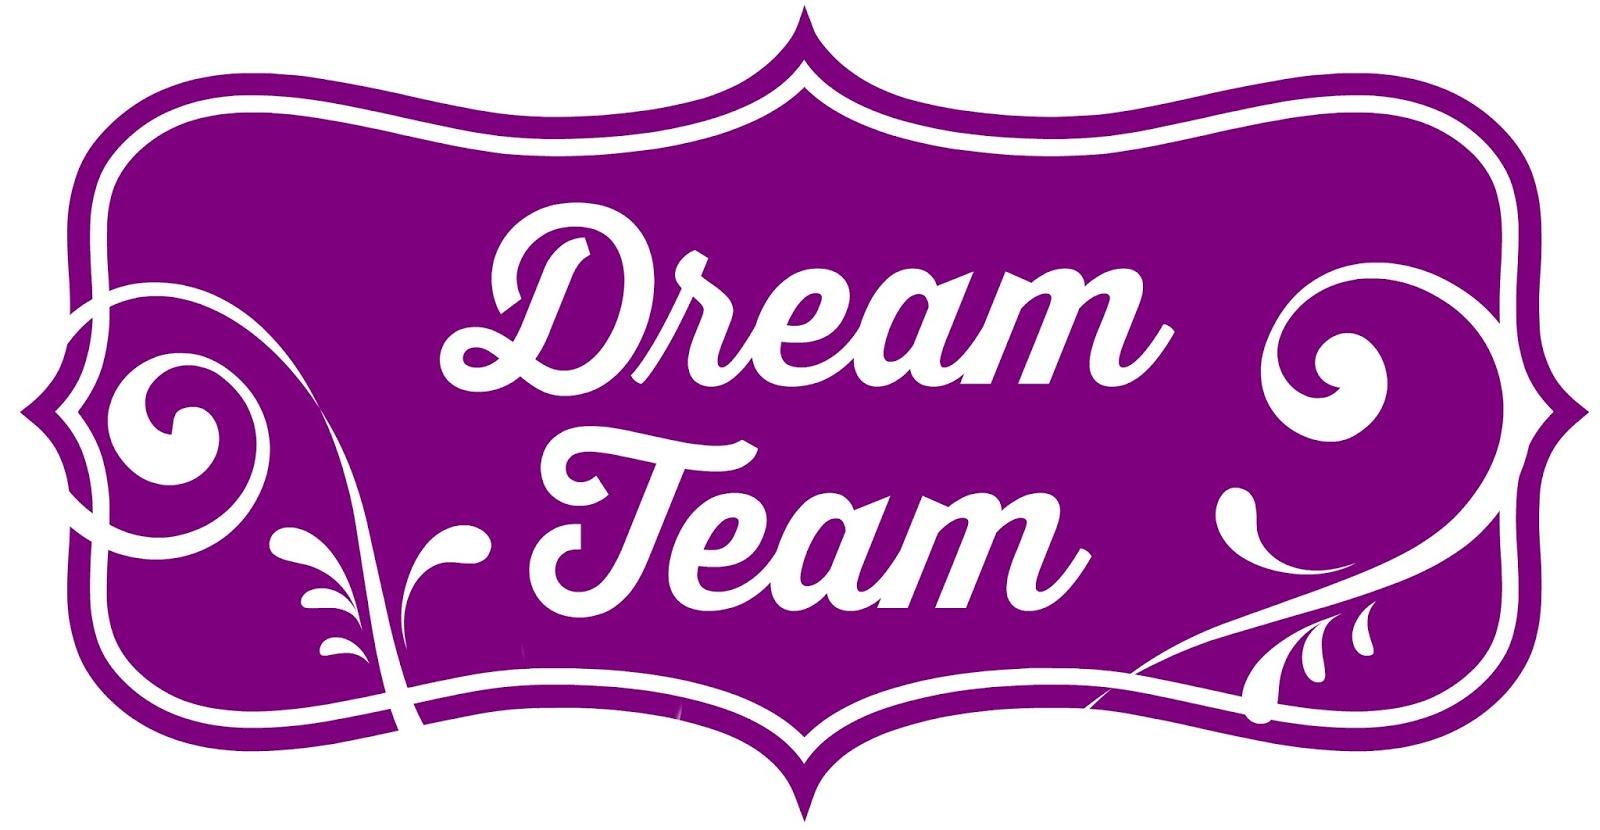 Free Dream Team